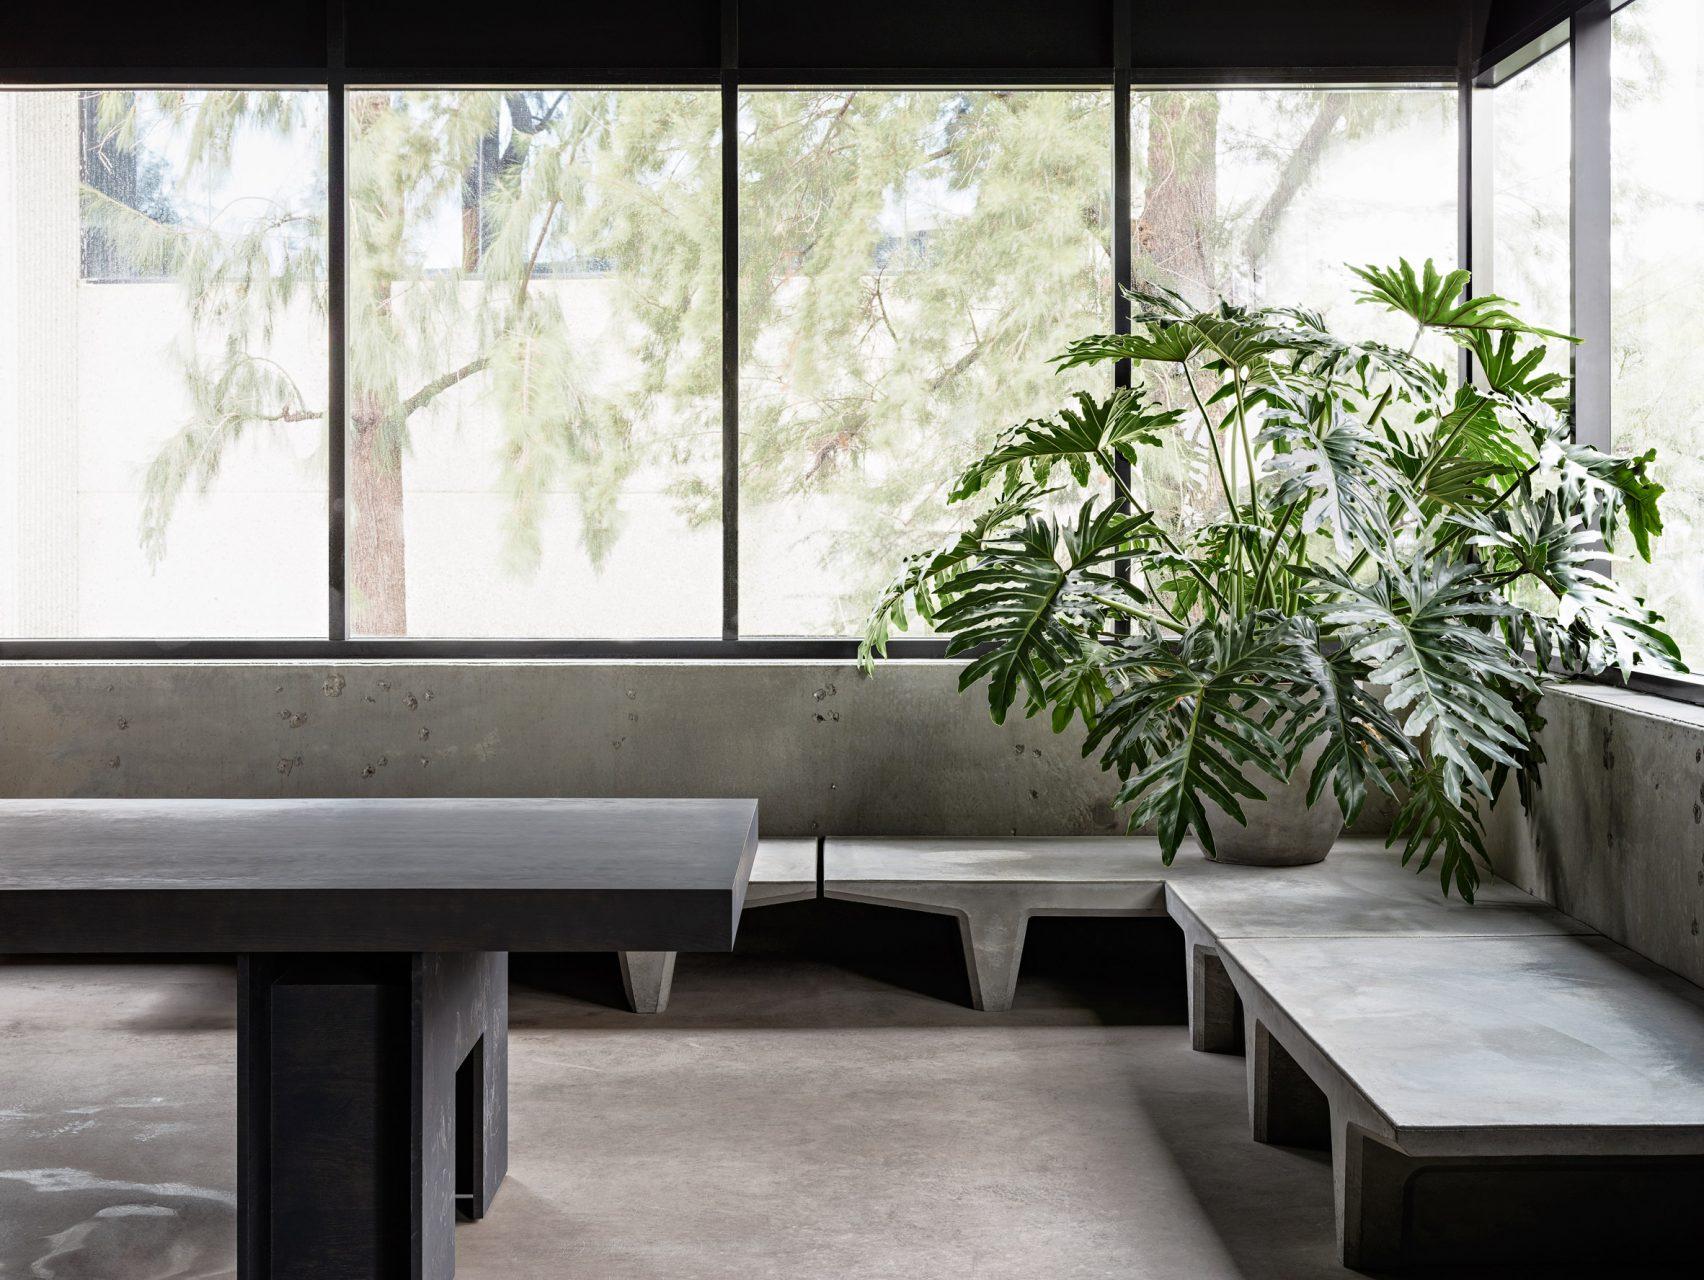 yeezy-studio-kanye-west-willo-perron-calabasas-california_-1704x1280.jpg